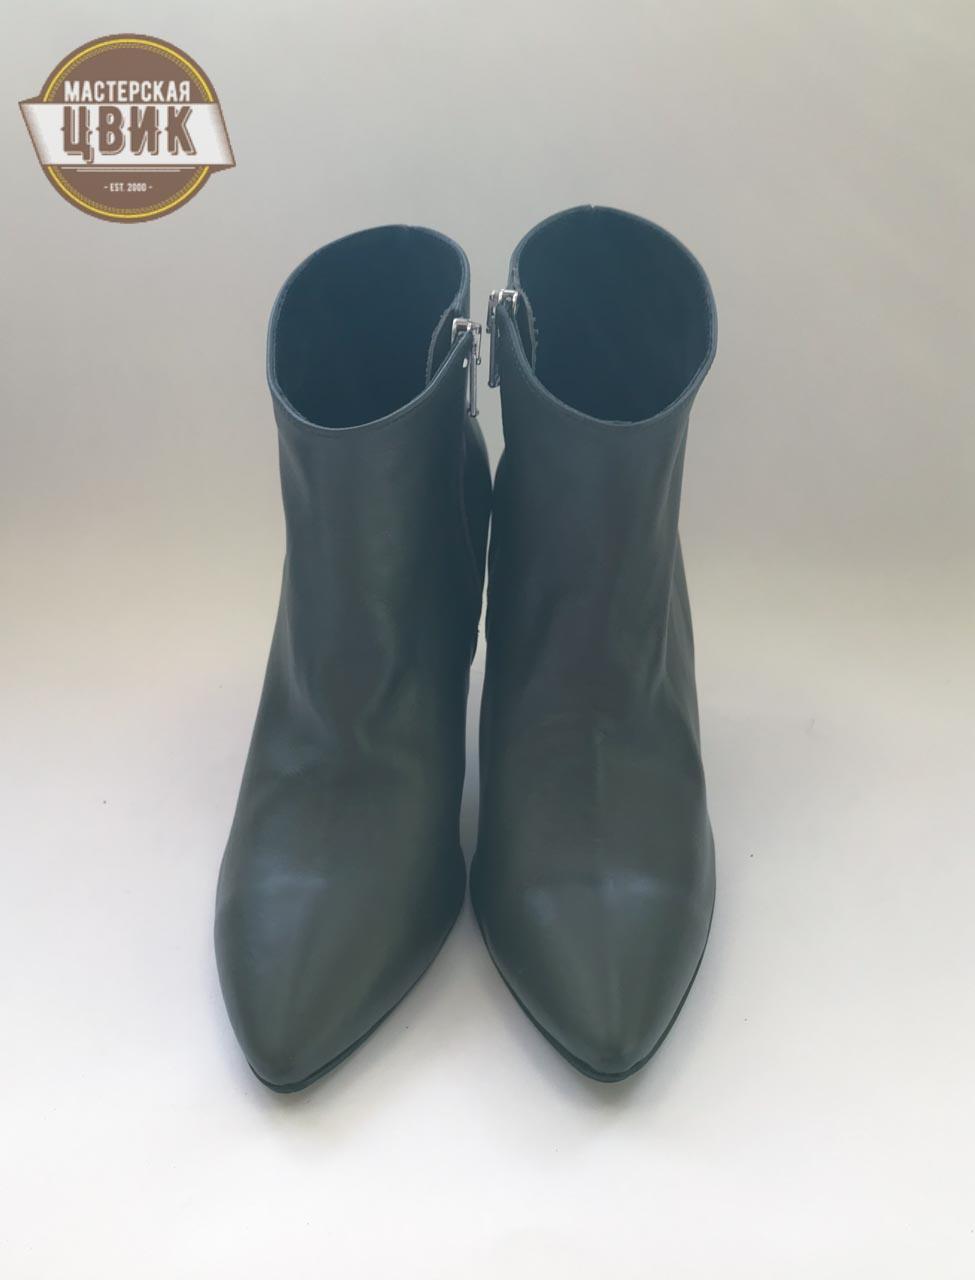 individualnyj-poshiv-obuvi-minsk-39 Индивидуальный пошив обуви